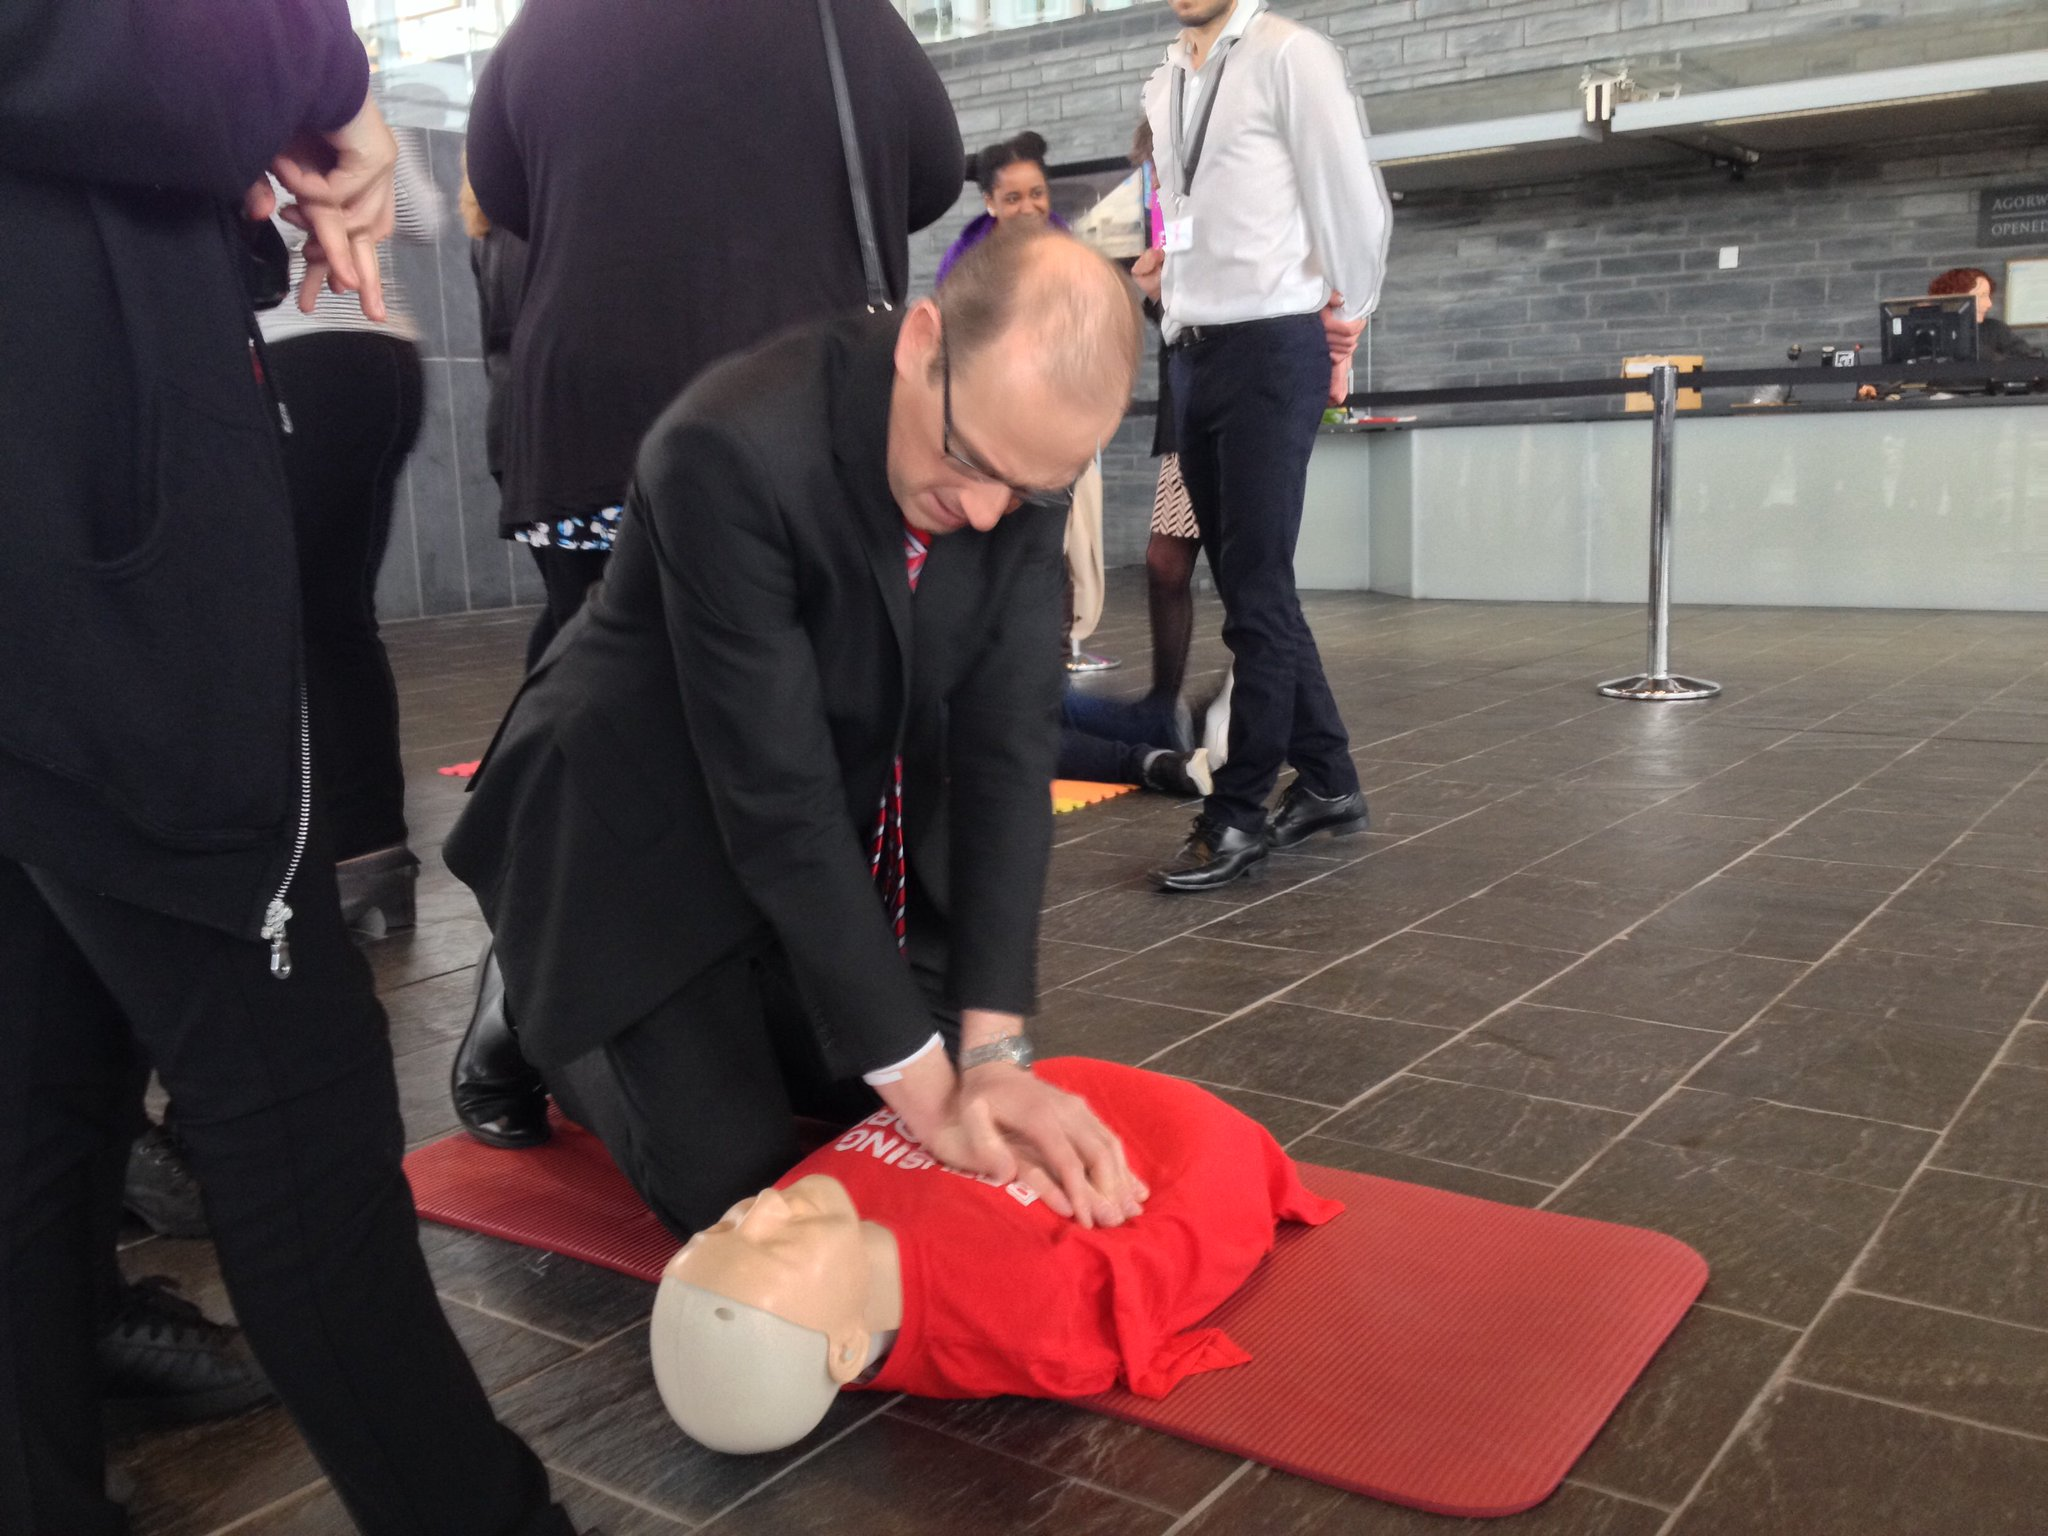 Llyr Gruffydd with @CardiffYC volunteers at the @BritishRedCross Senedd first aid event. #LearnAndShare https://t.co/e6tijPNHKD